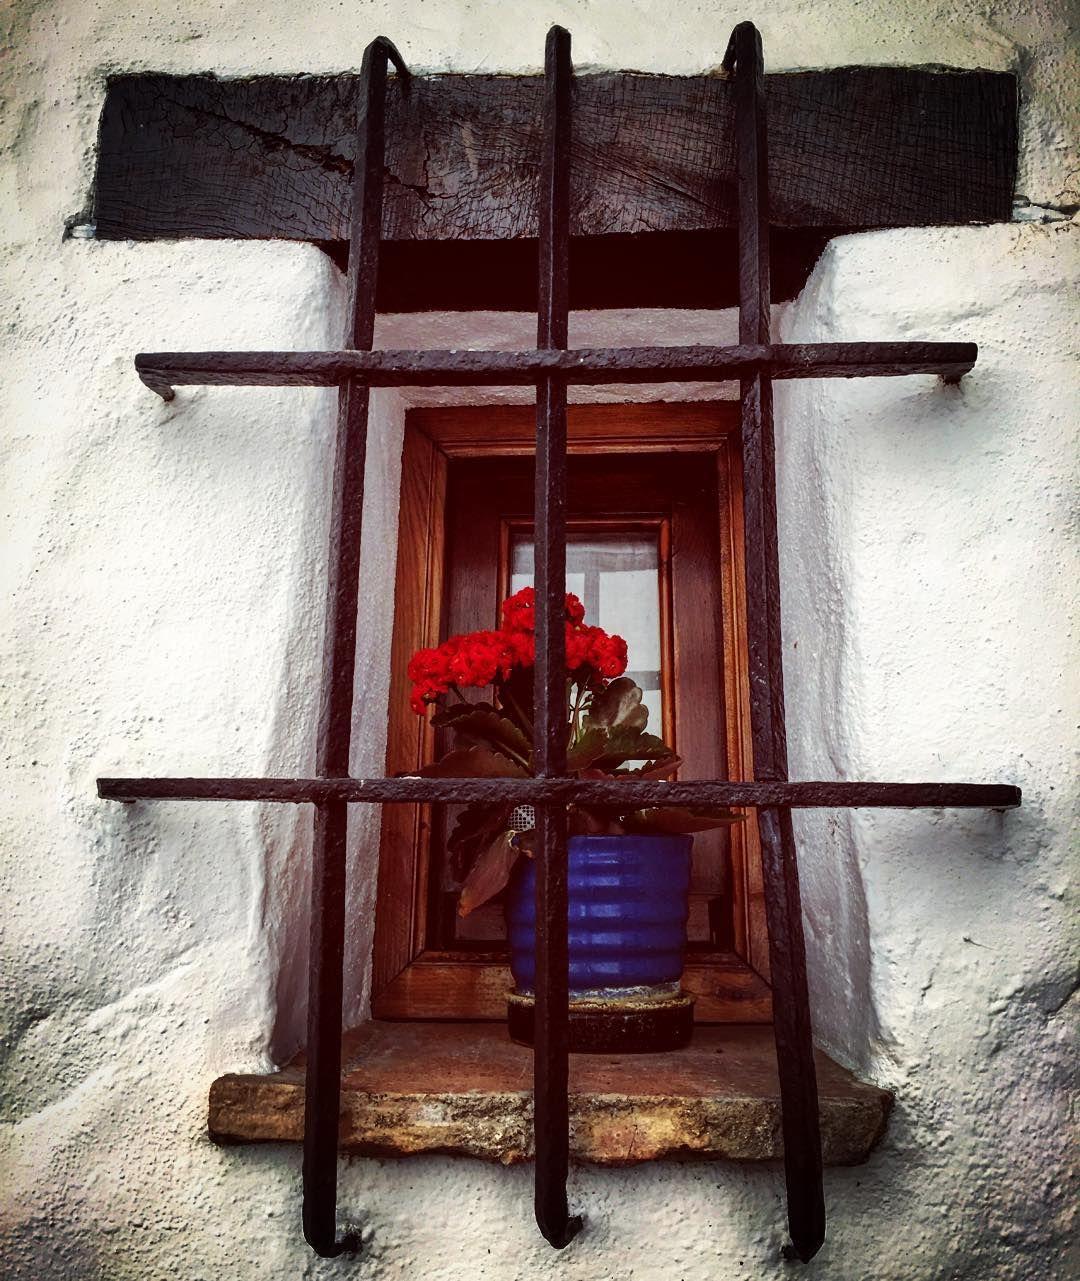 Sierra de Grazalema by molinanino via Instagram #Grazalema #andalucia #Spain #Cadiz